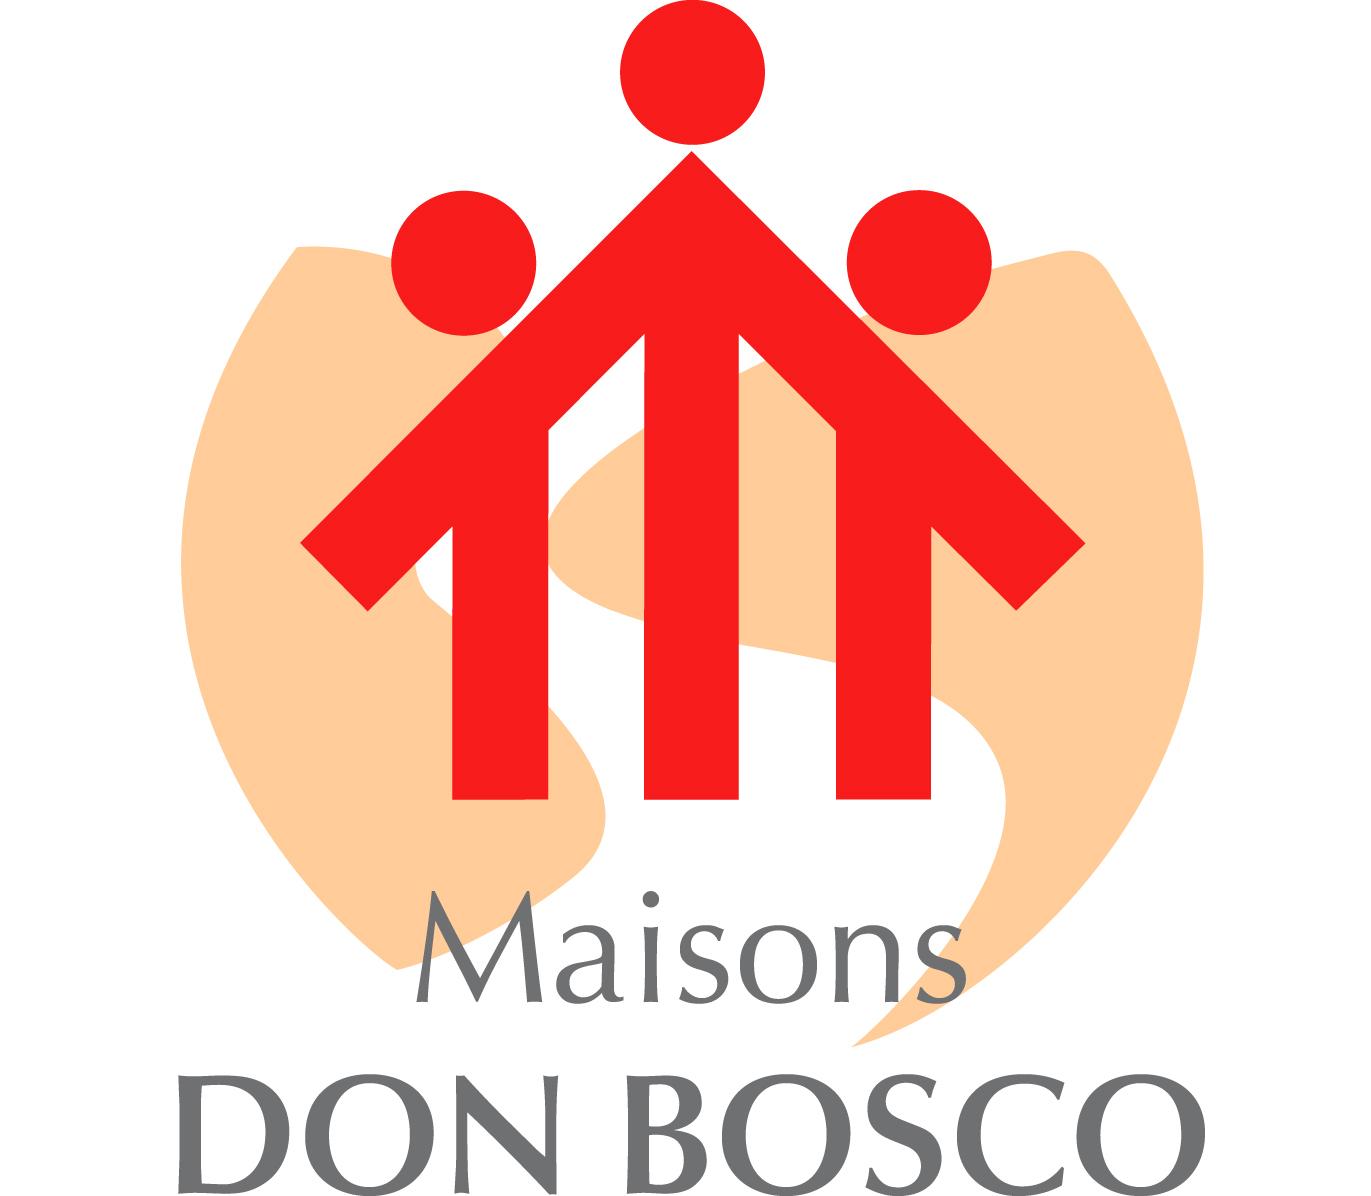 Maison Don Bosco